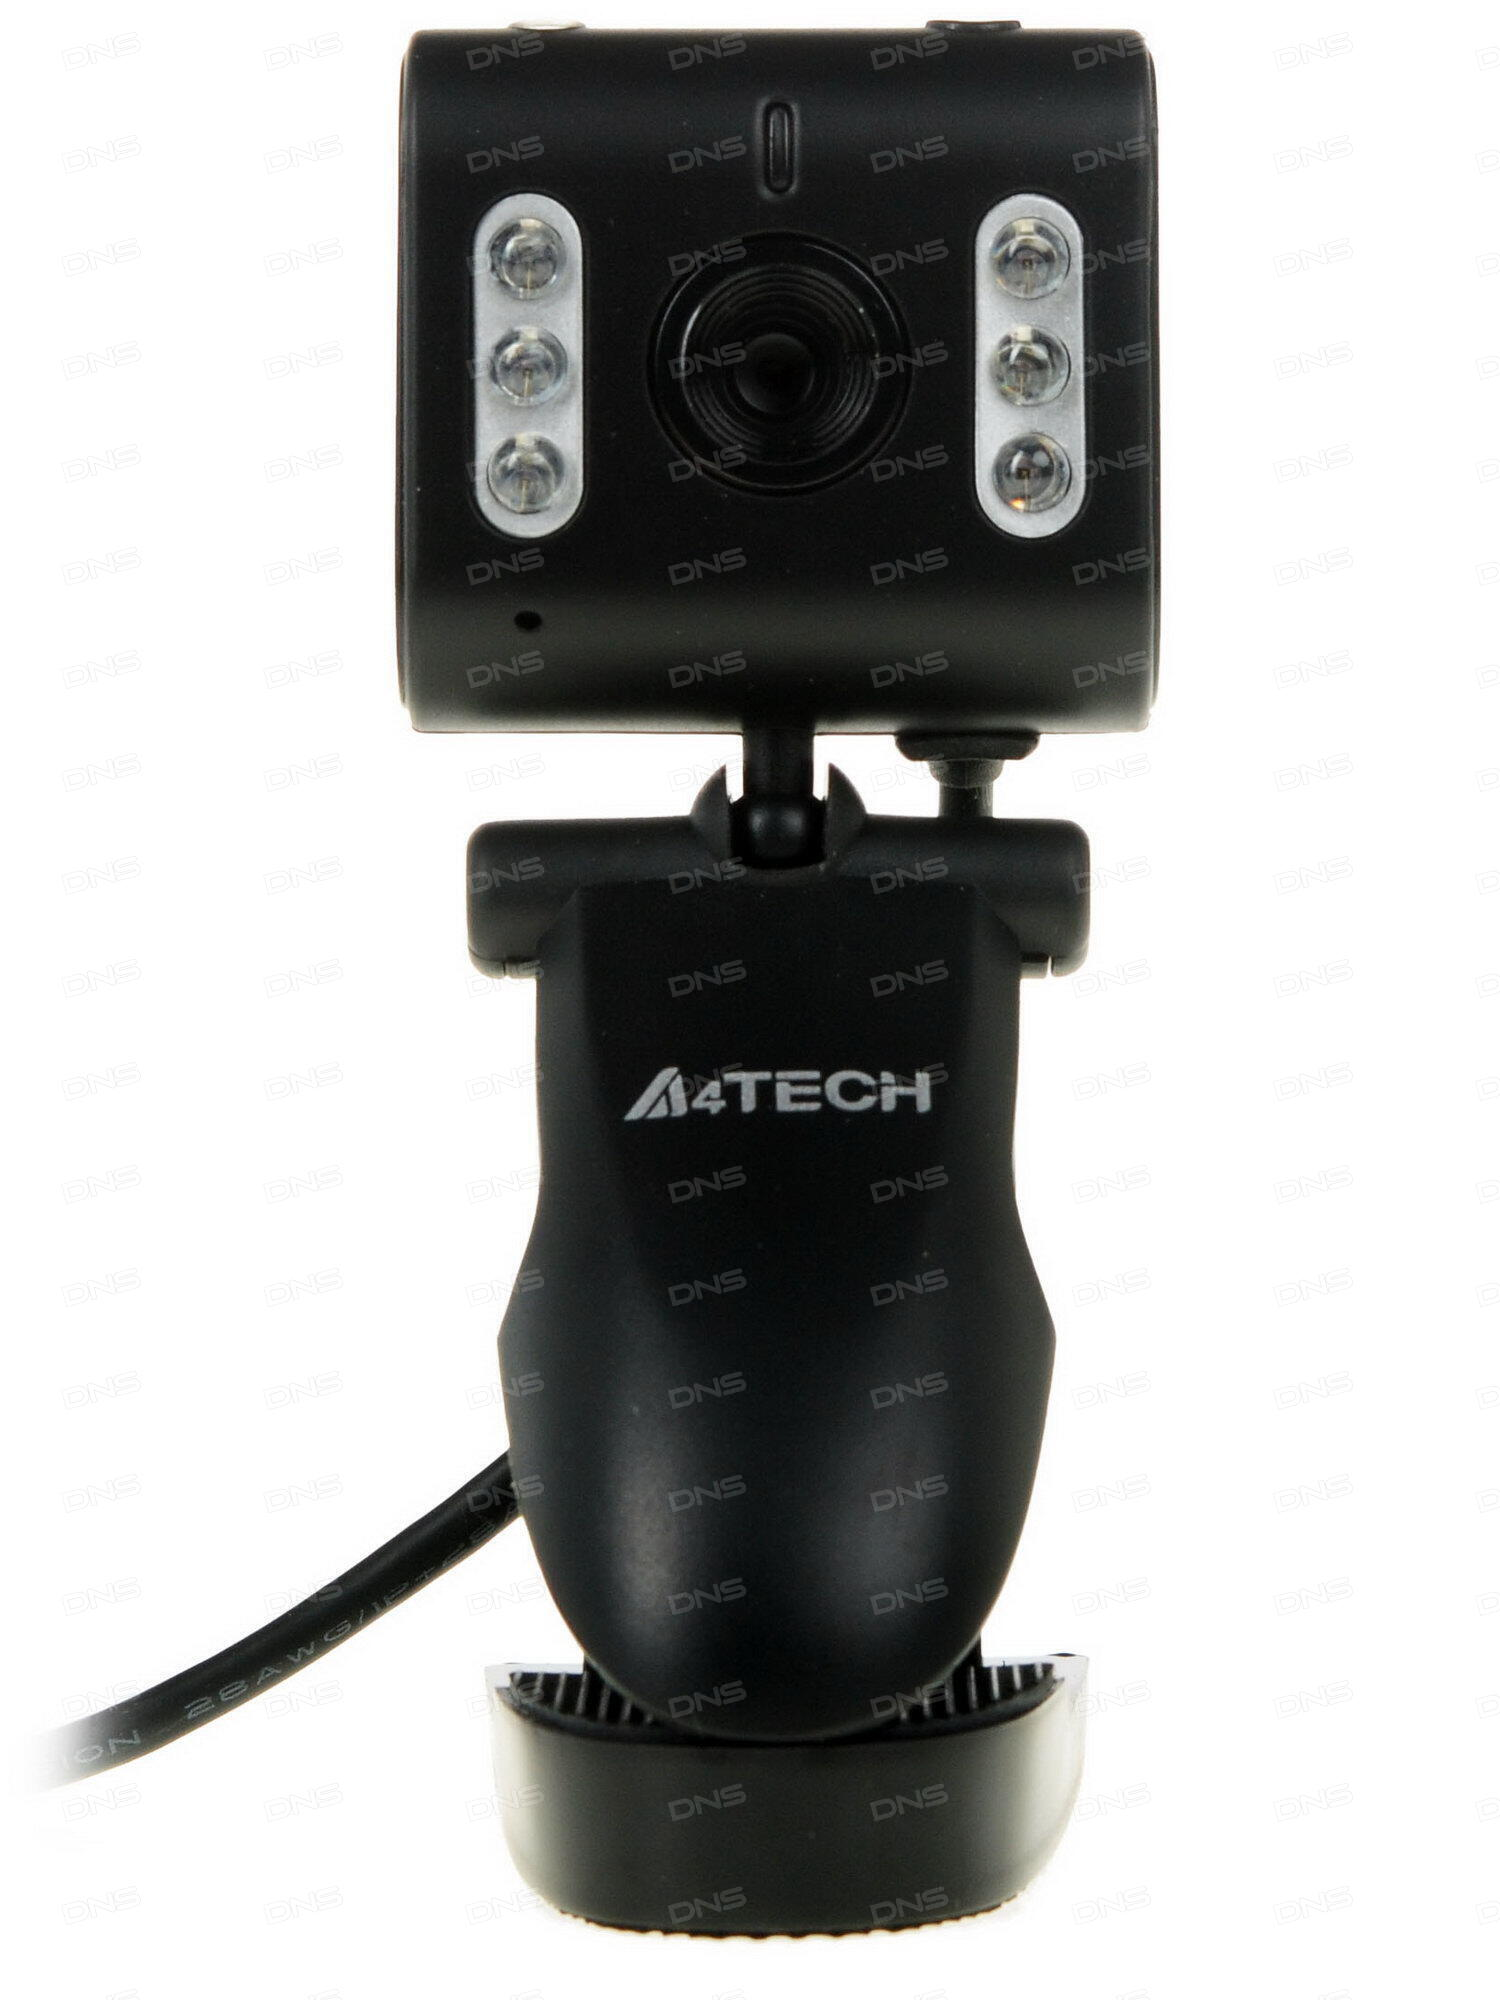 A4tech pk 333e